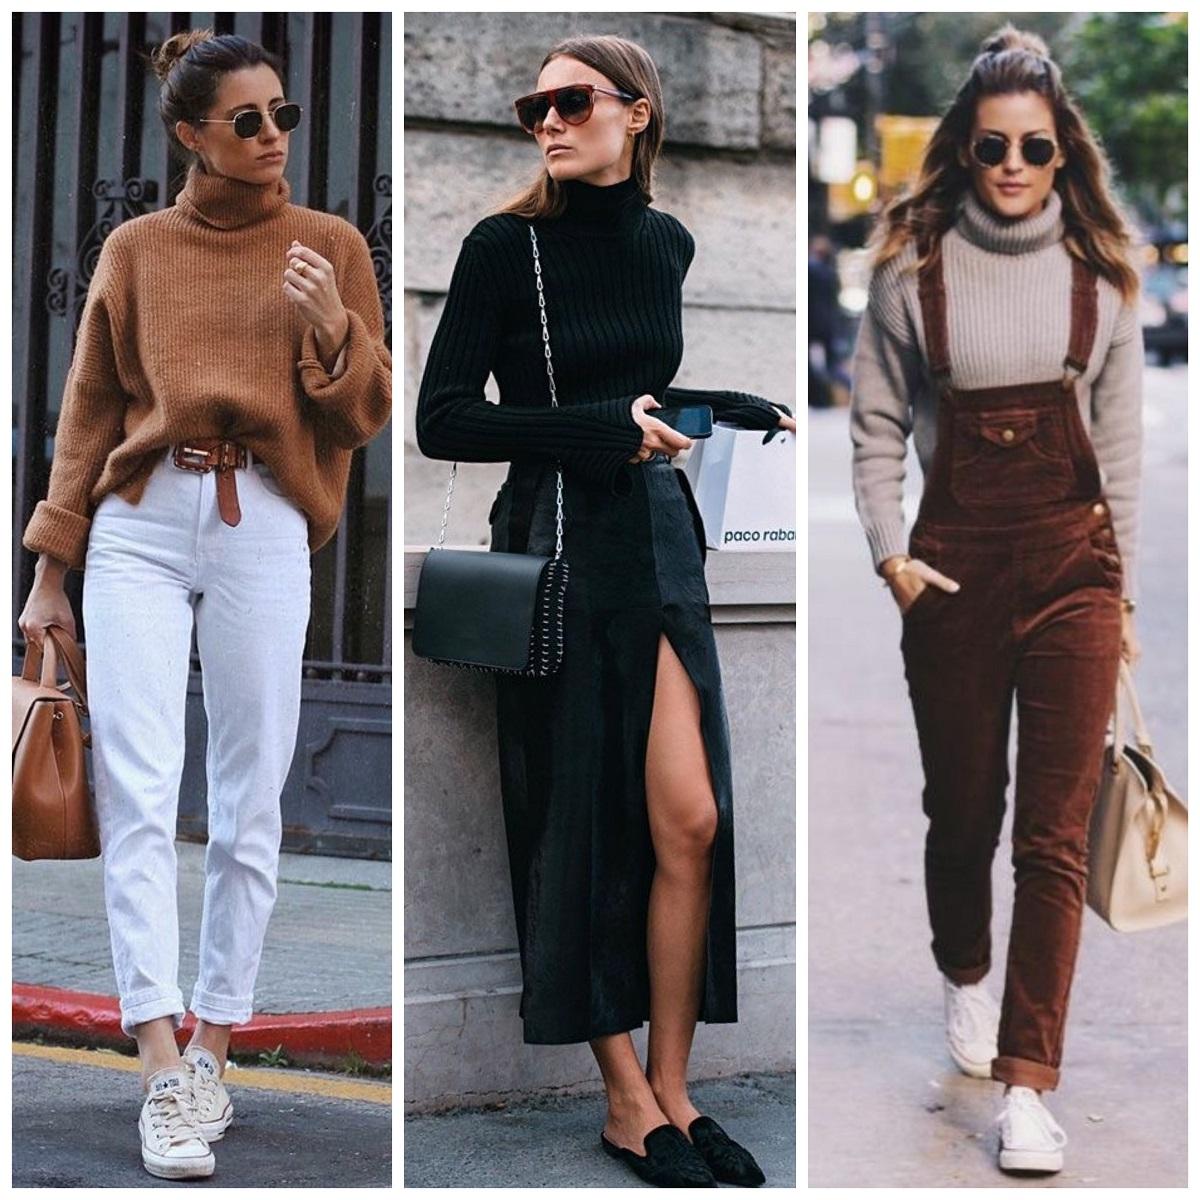 moda - tendencias inverno foto de dentro 1